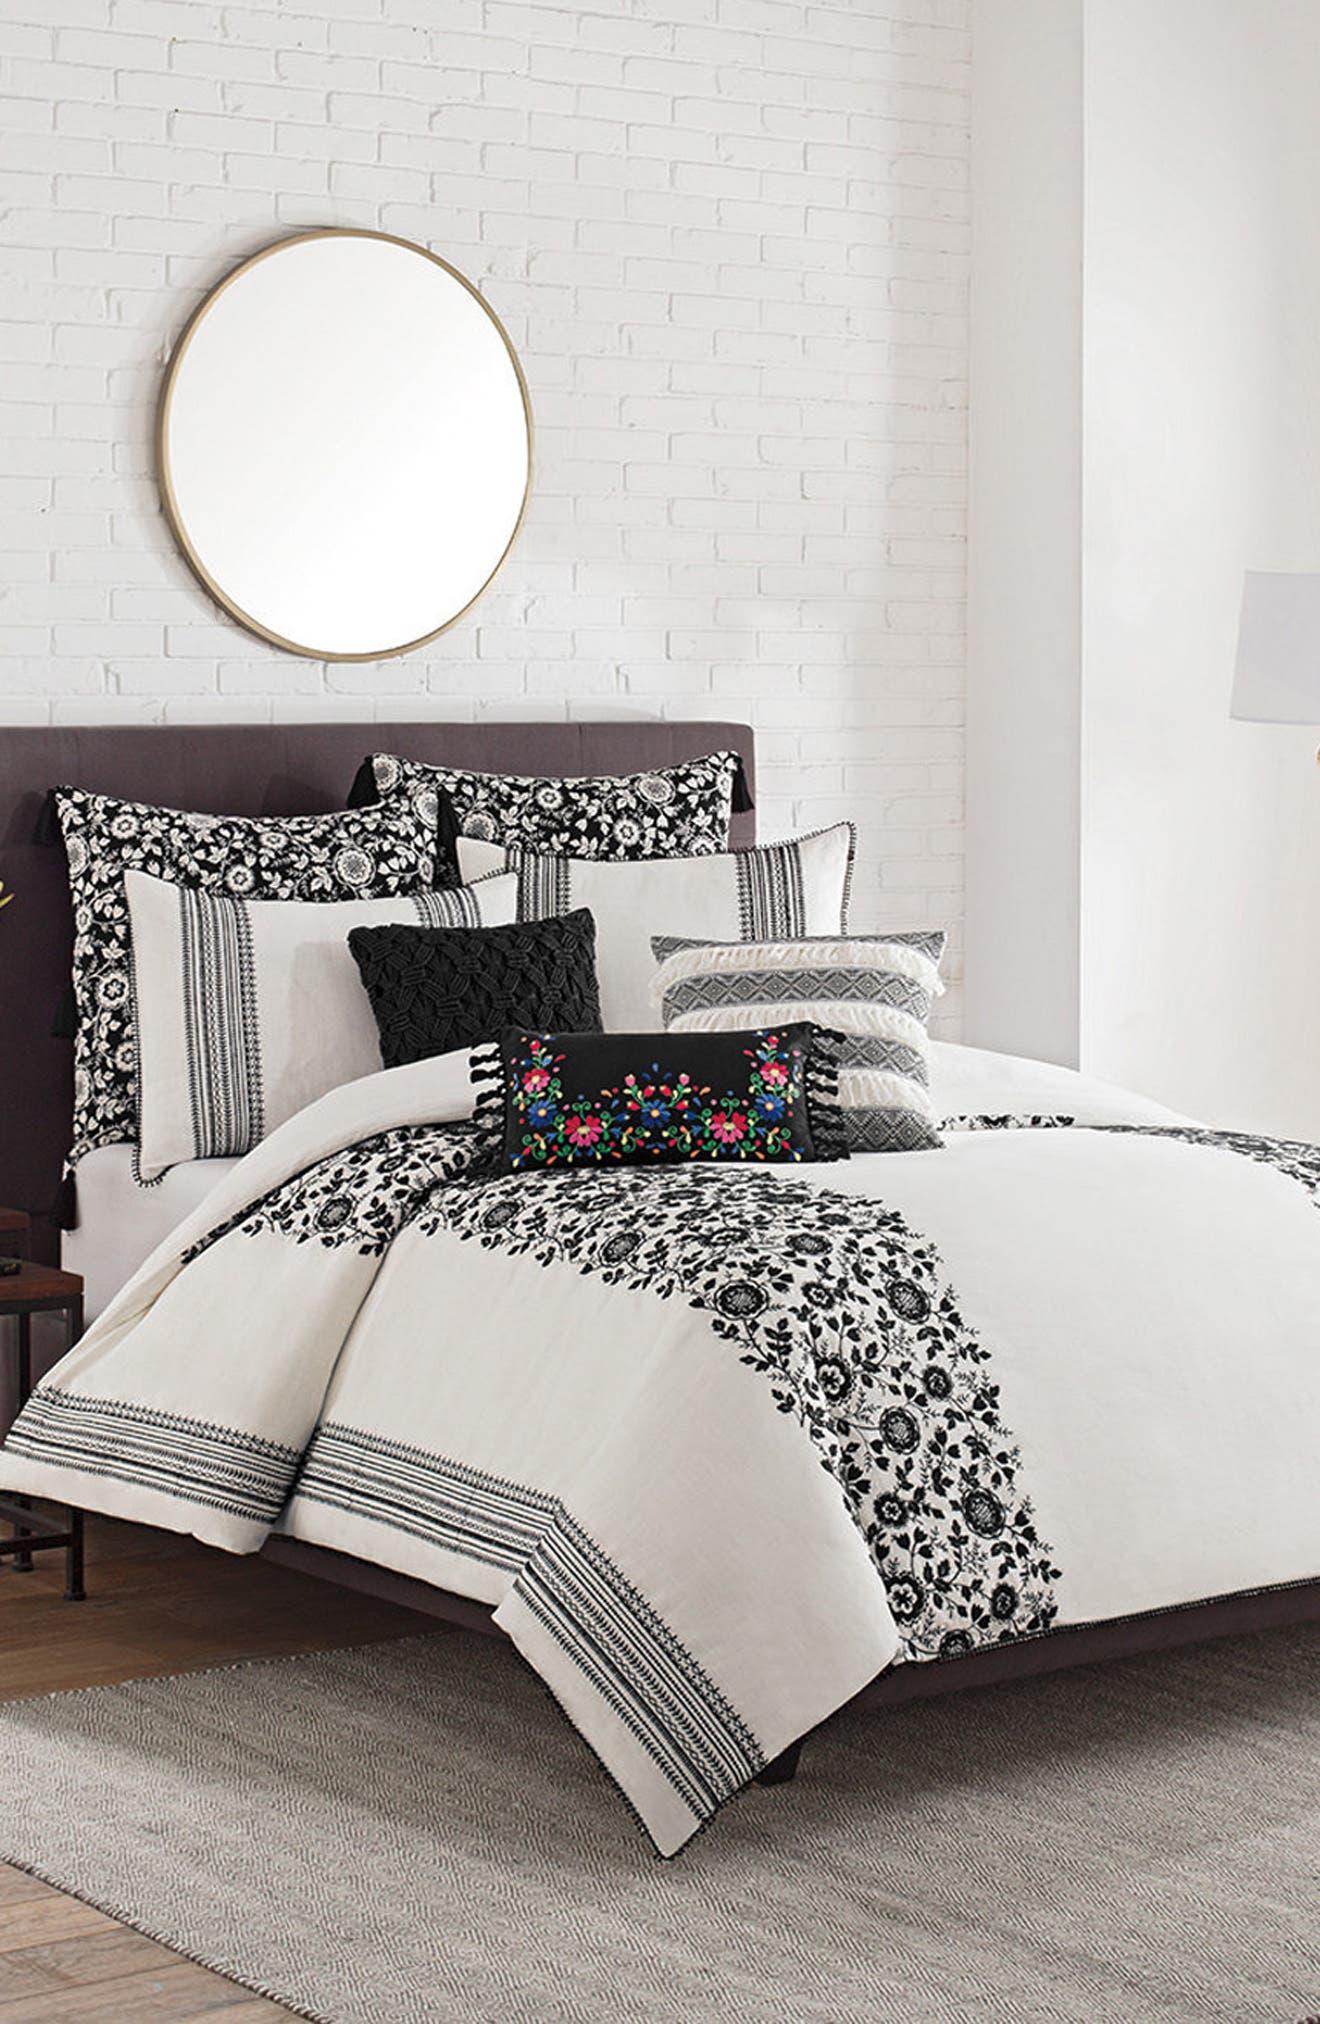 Folk Floral Duvet Cover,                         Main,                         color, White/ Black